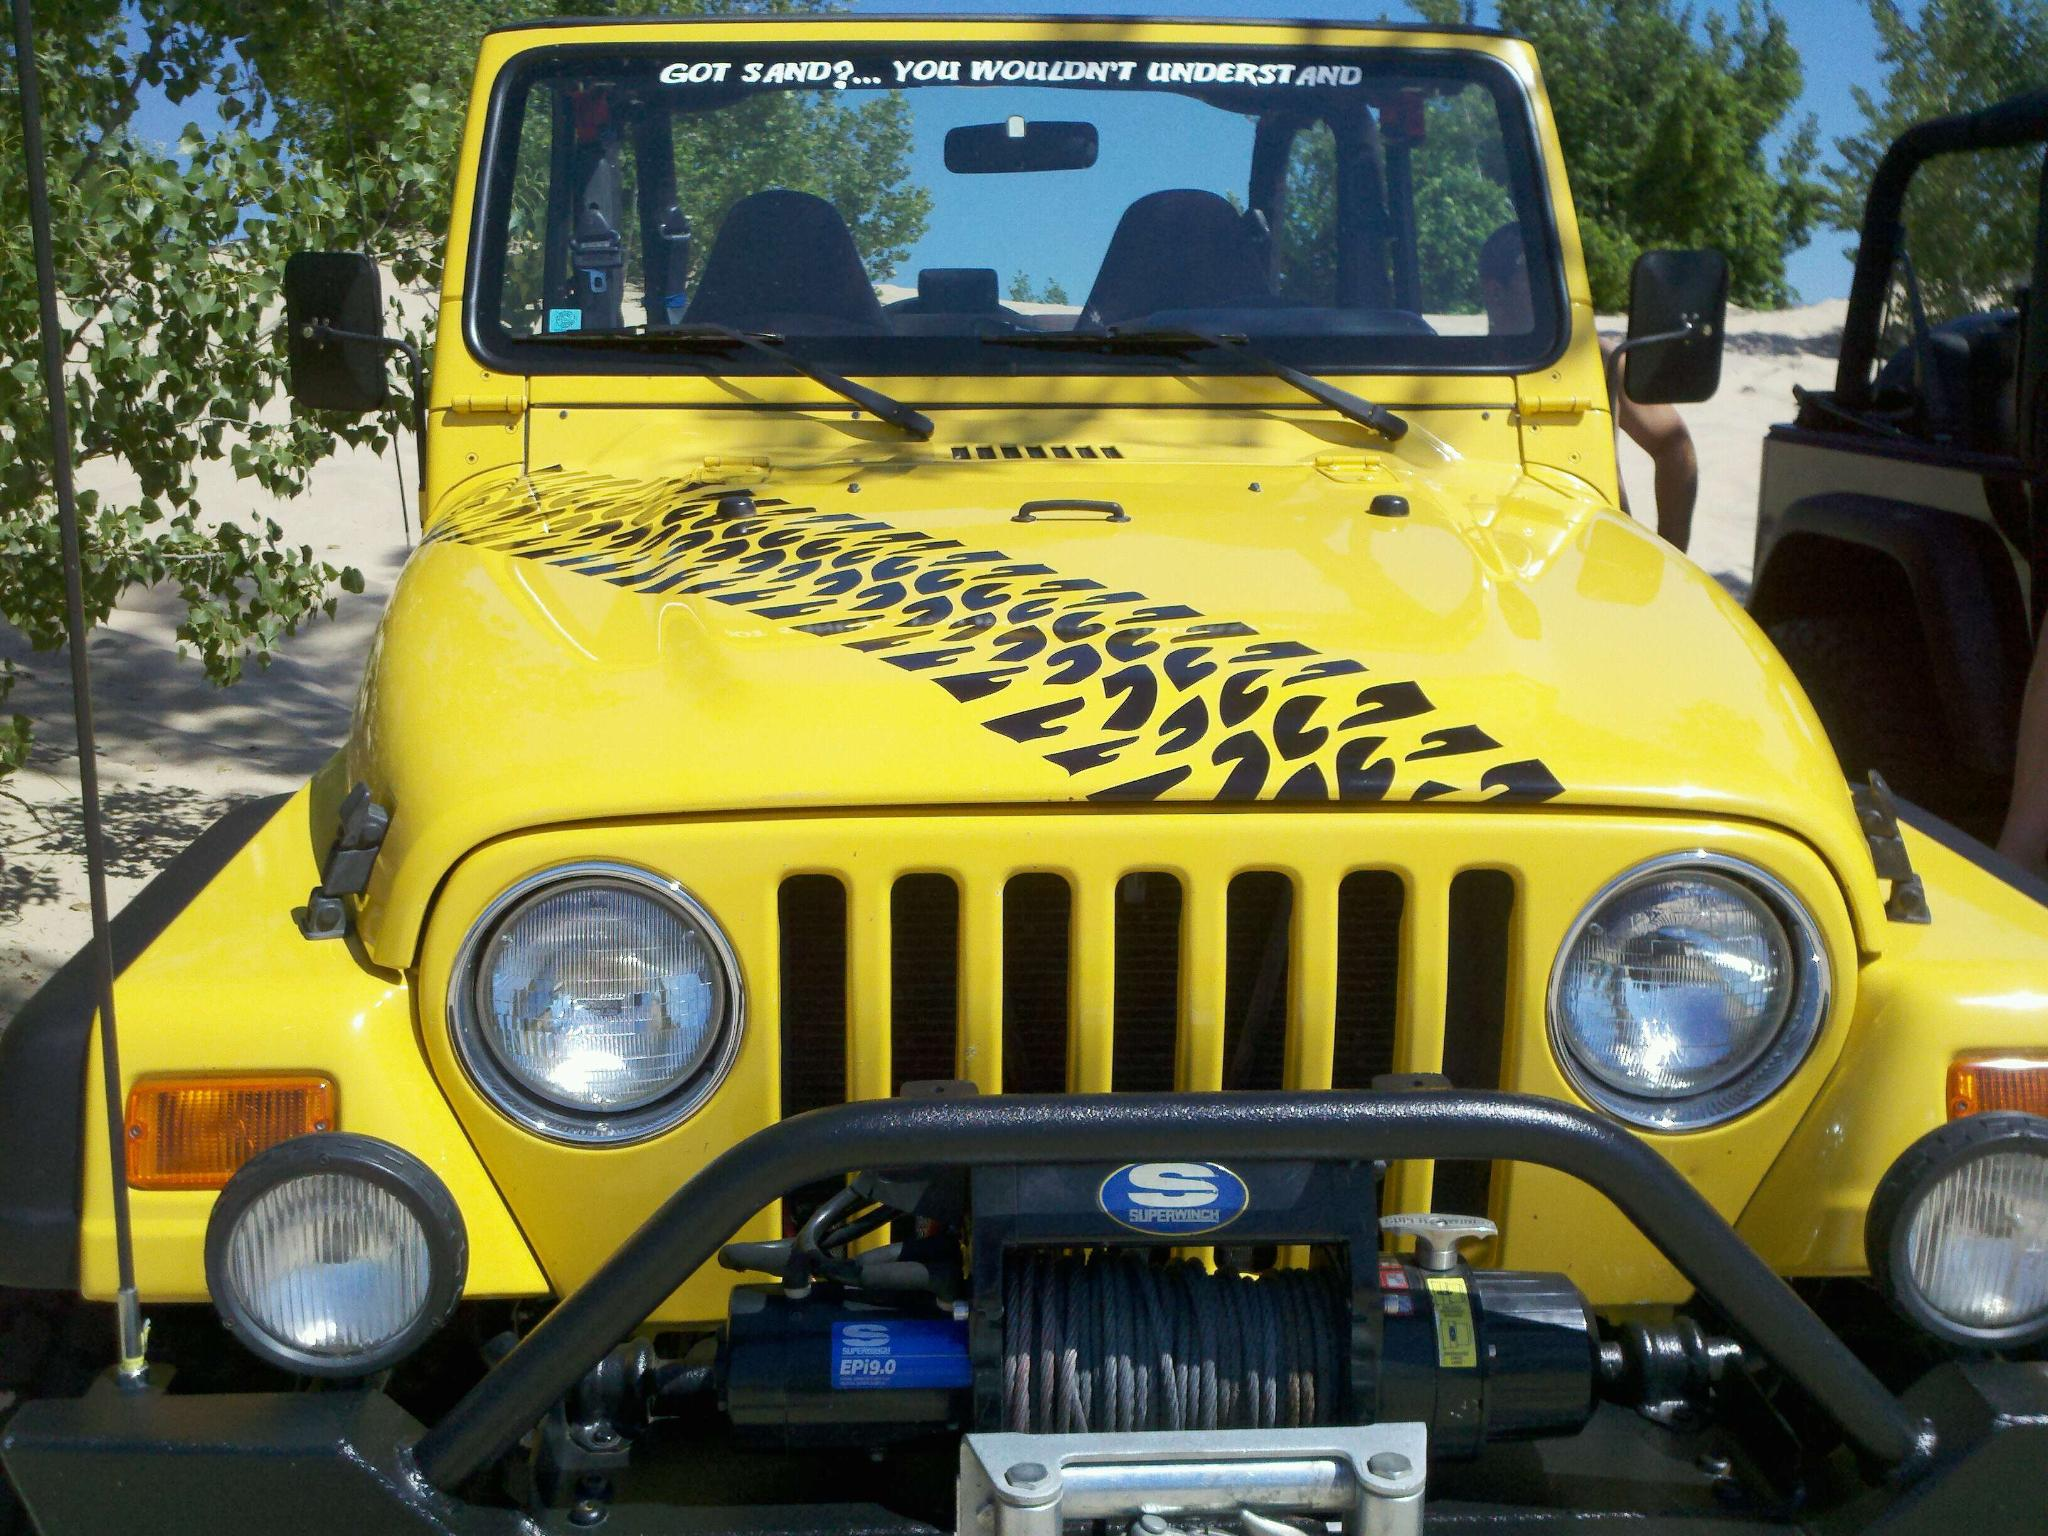 product: 2 jeep rubicon wrangler jk hood sticker decal